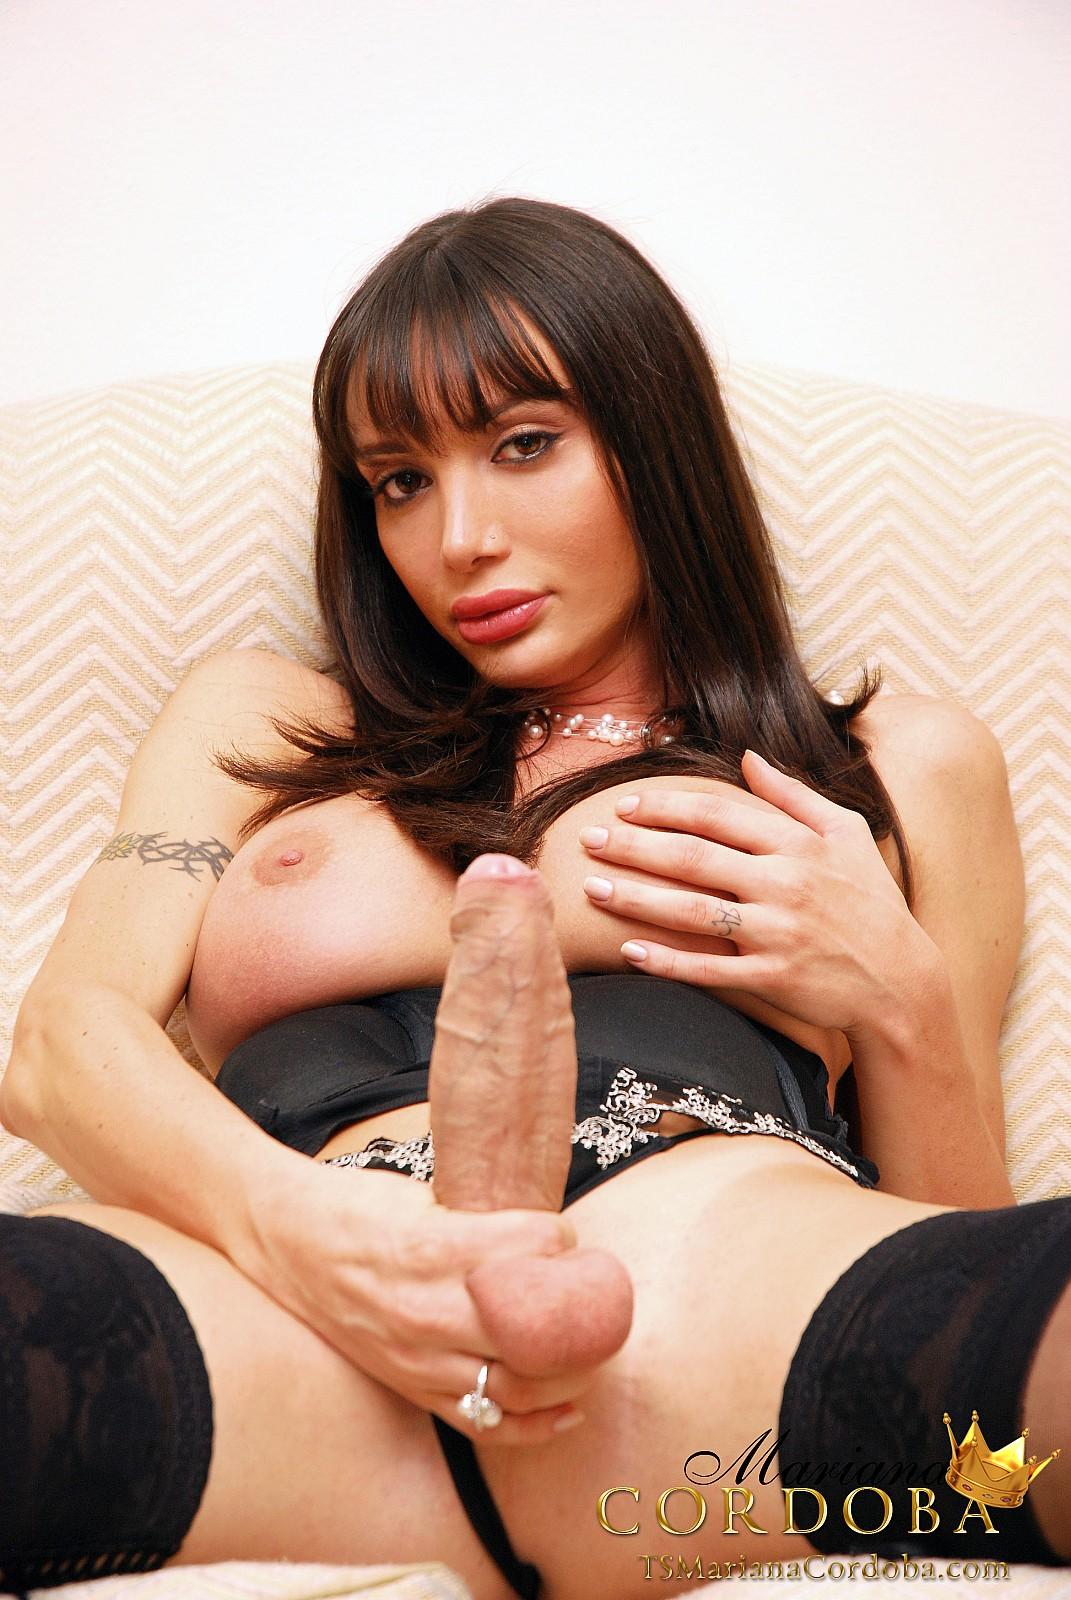 Mariana cordoba nude photo #3